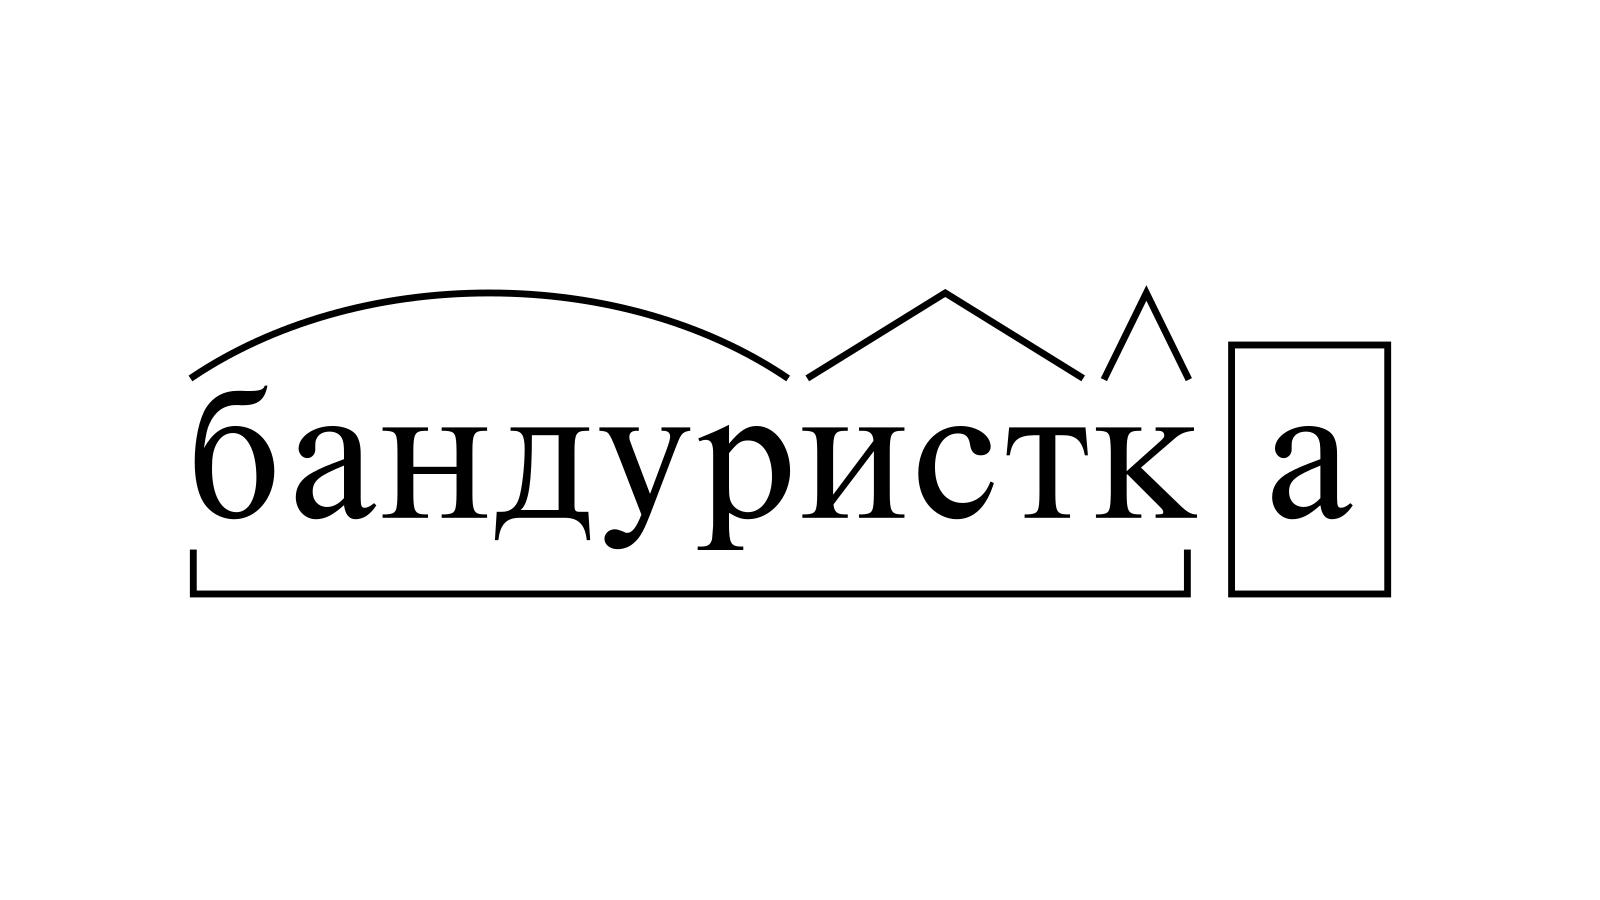 Разбор слова «бандуристка» по составу